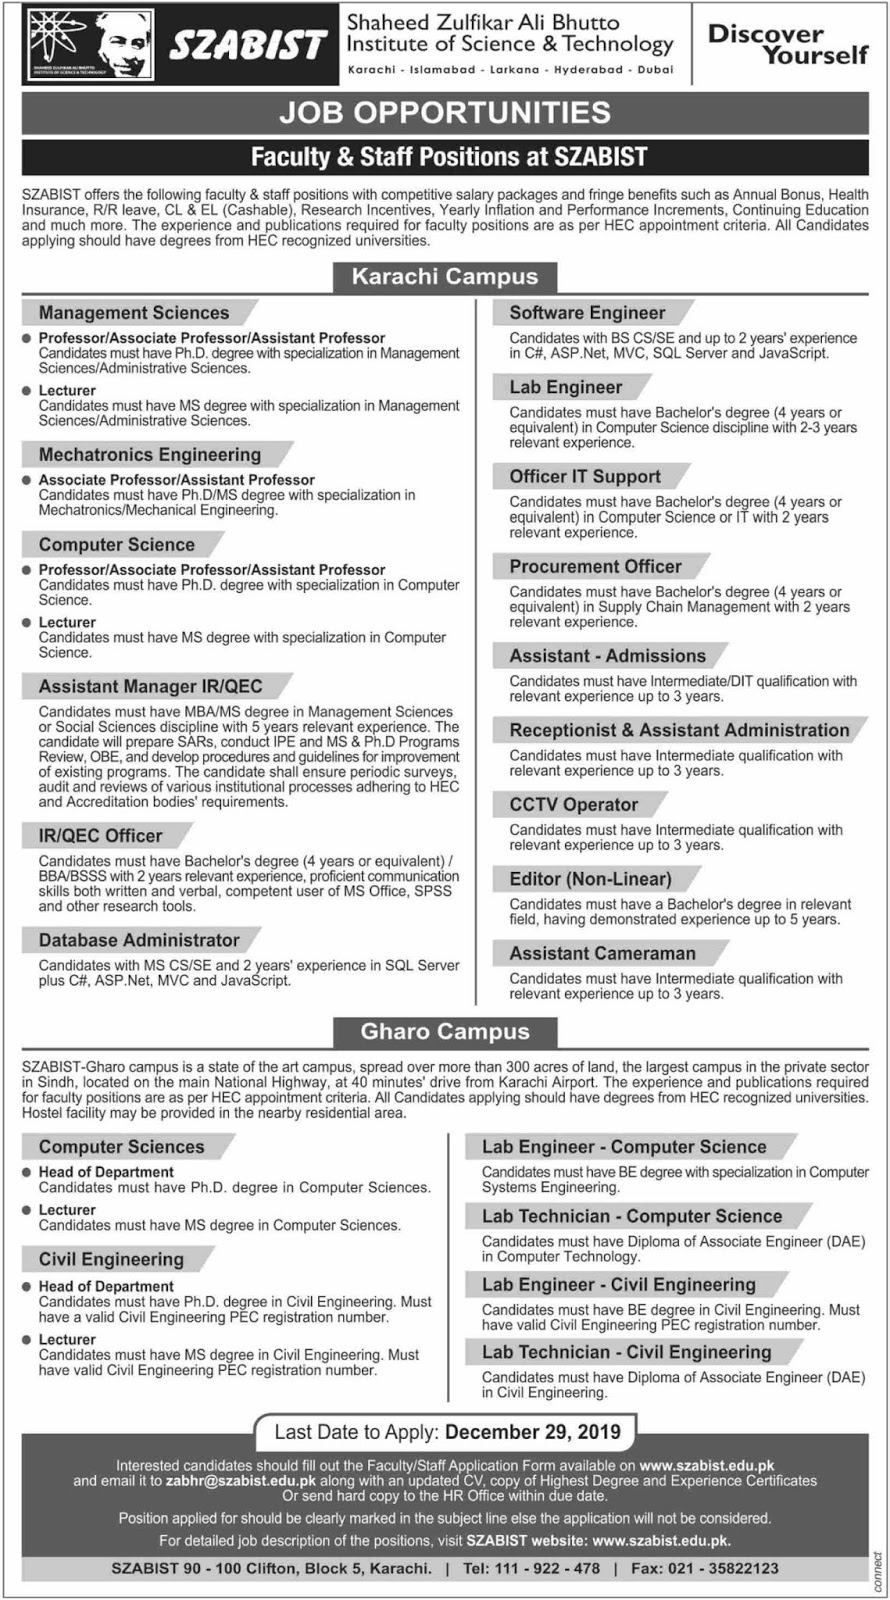 Latest SZABIST Jobs 2019 Shaheed Zulfikar Ali Bhutto Institute of Science & Technology